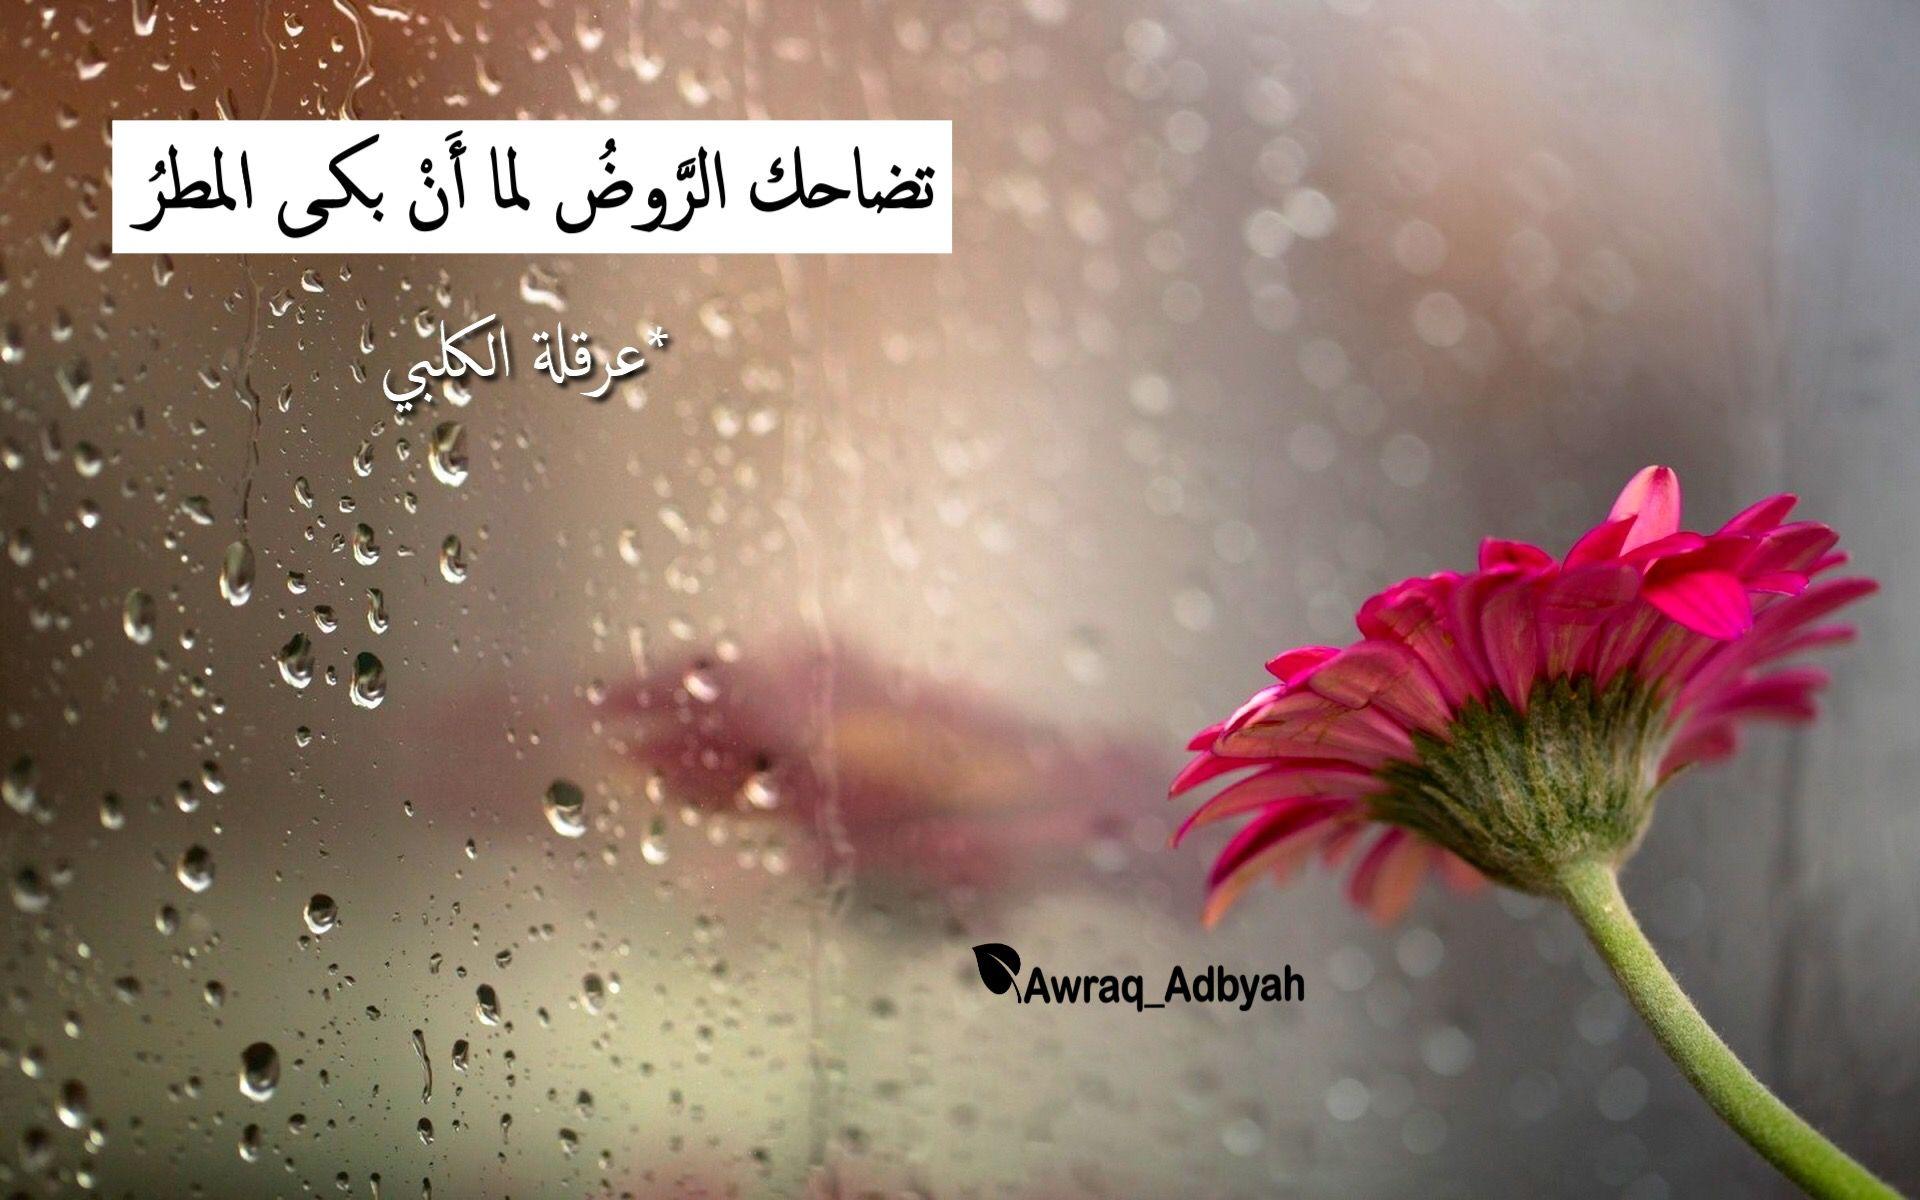 Pin By أوراق أدبية On أوراق أدبية أدب شعر اقتباسات Rain Wallpapers Rainy Day Wallpaper Rain Pictures